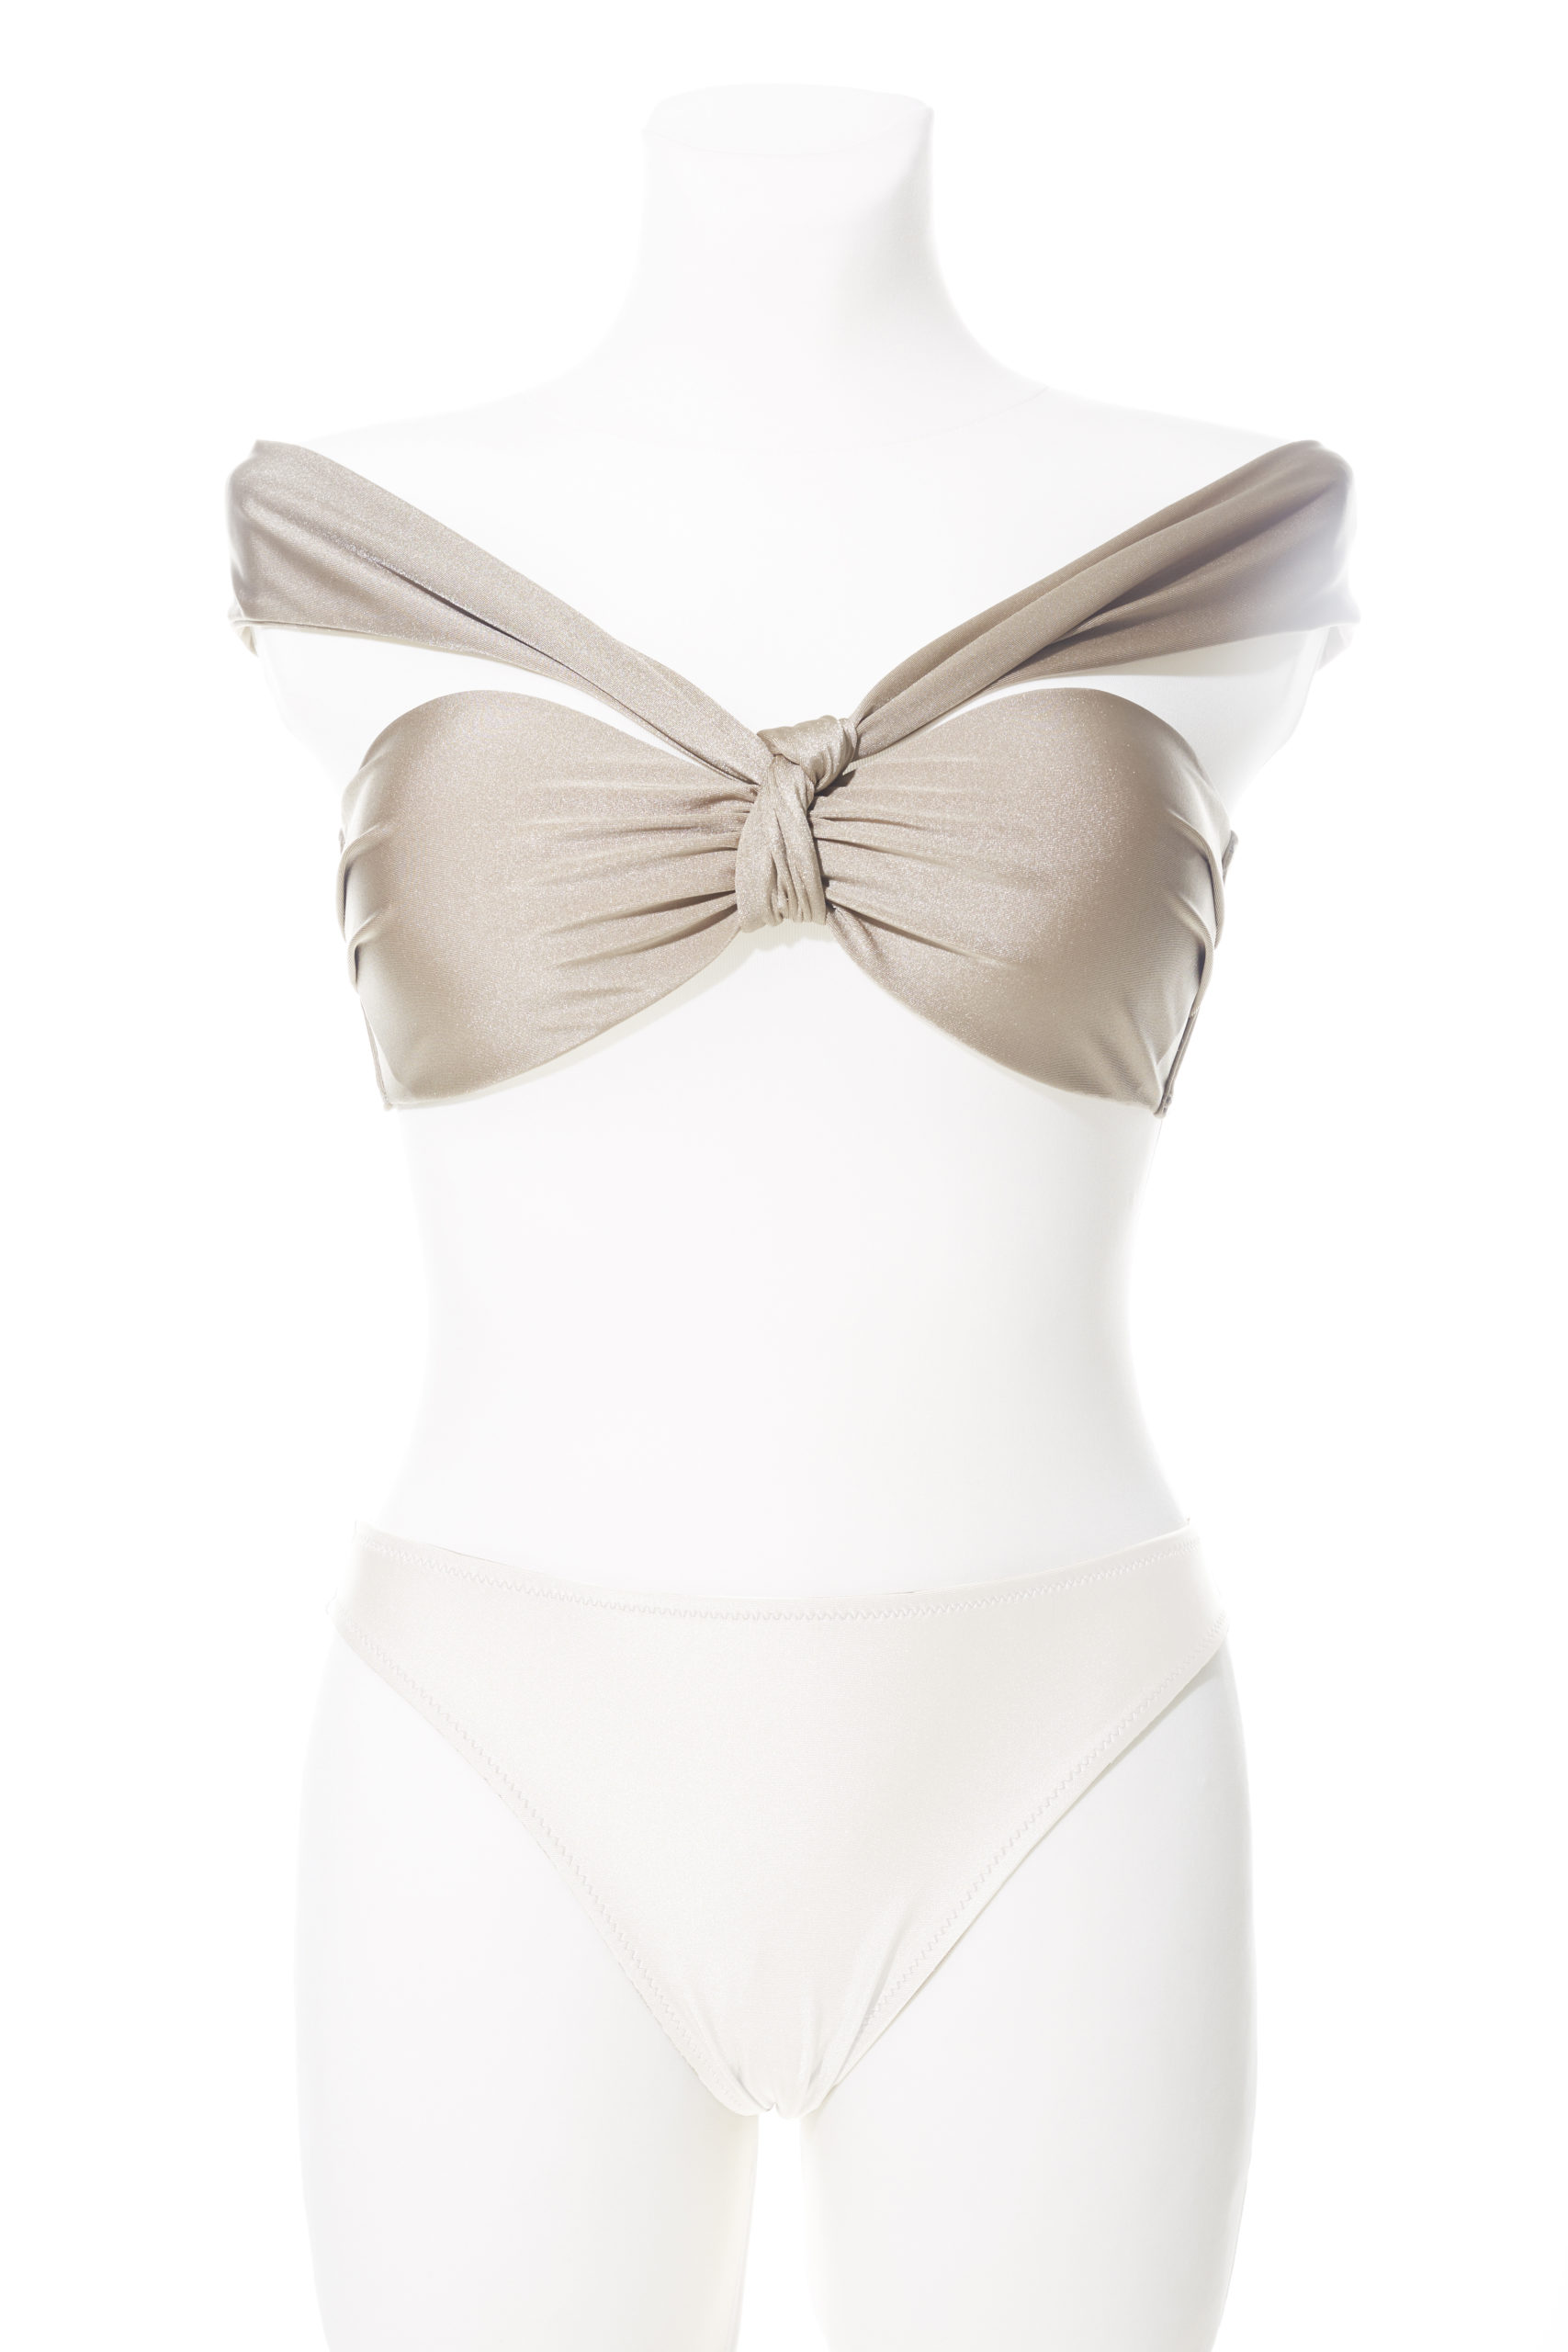 'VANILLA' Bikini Bandeau Form